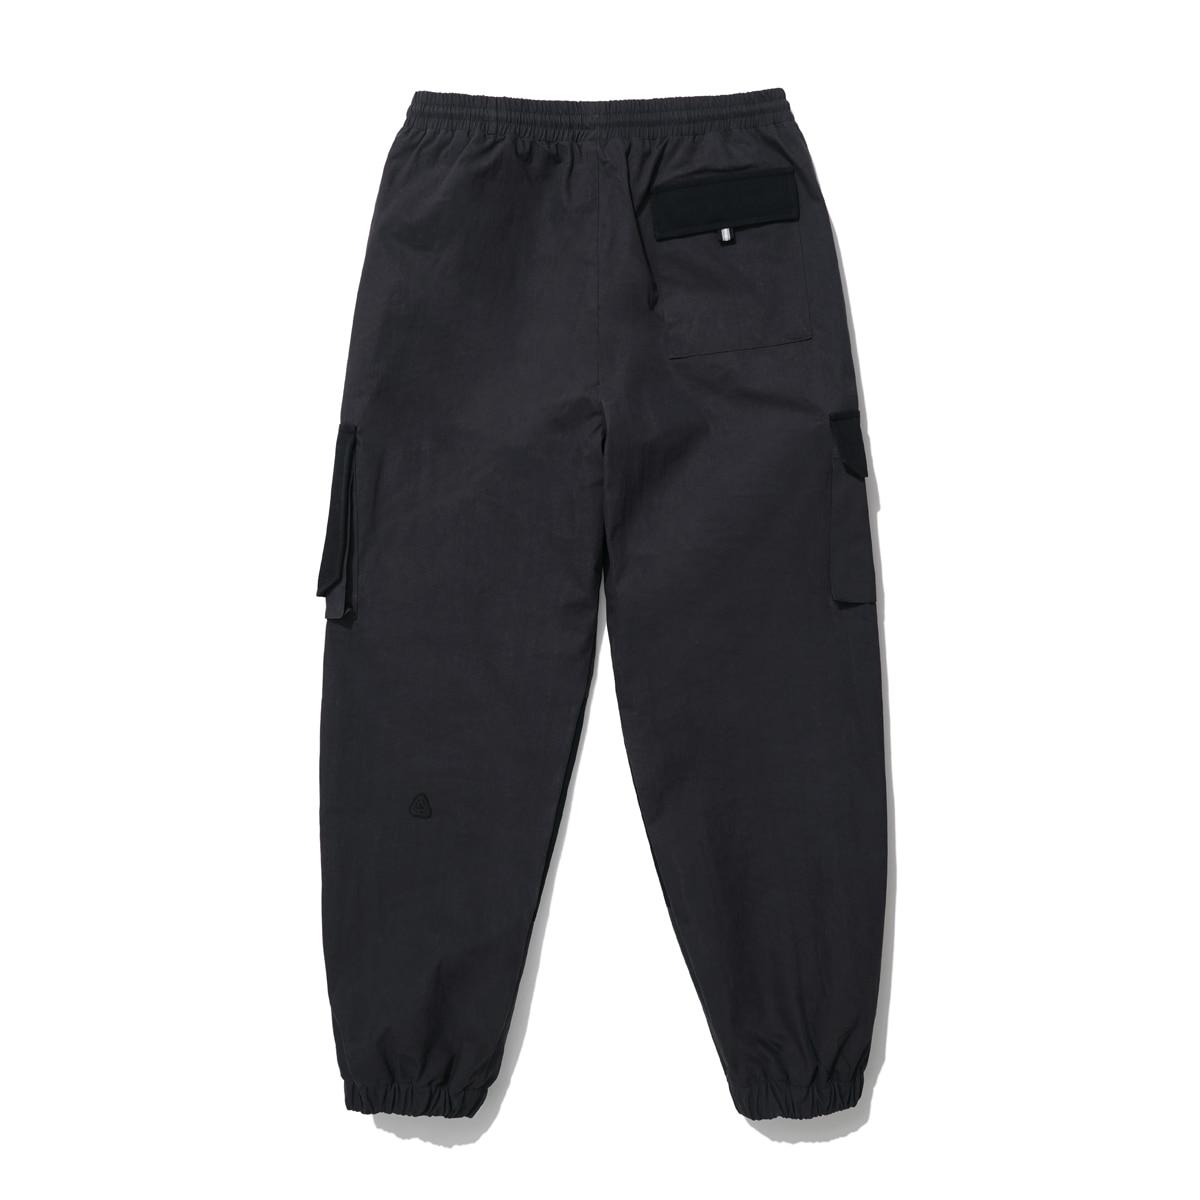 Utility Cago Pants (gray)